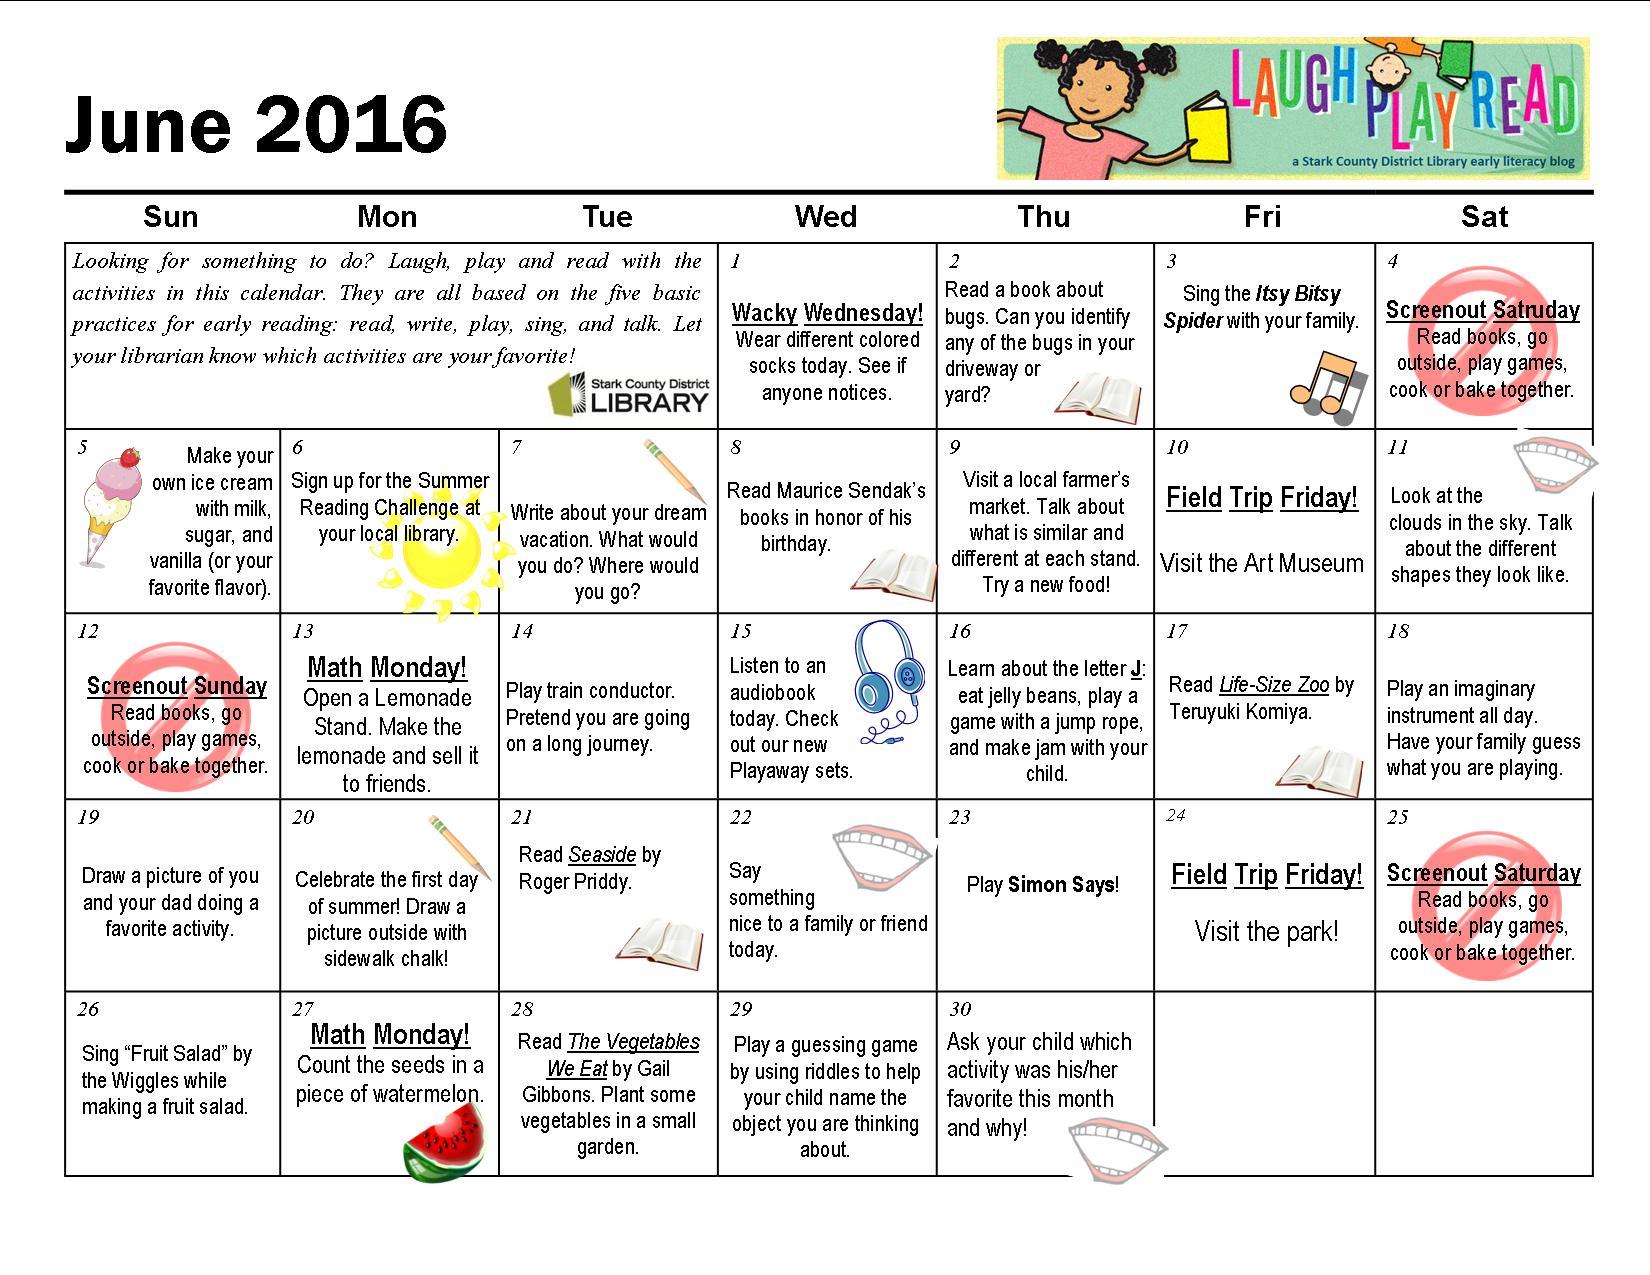 June Monthly Activity Calendar